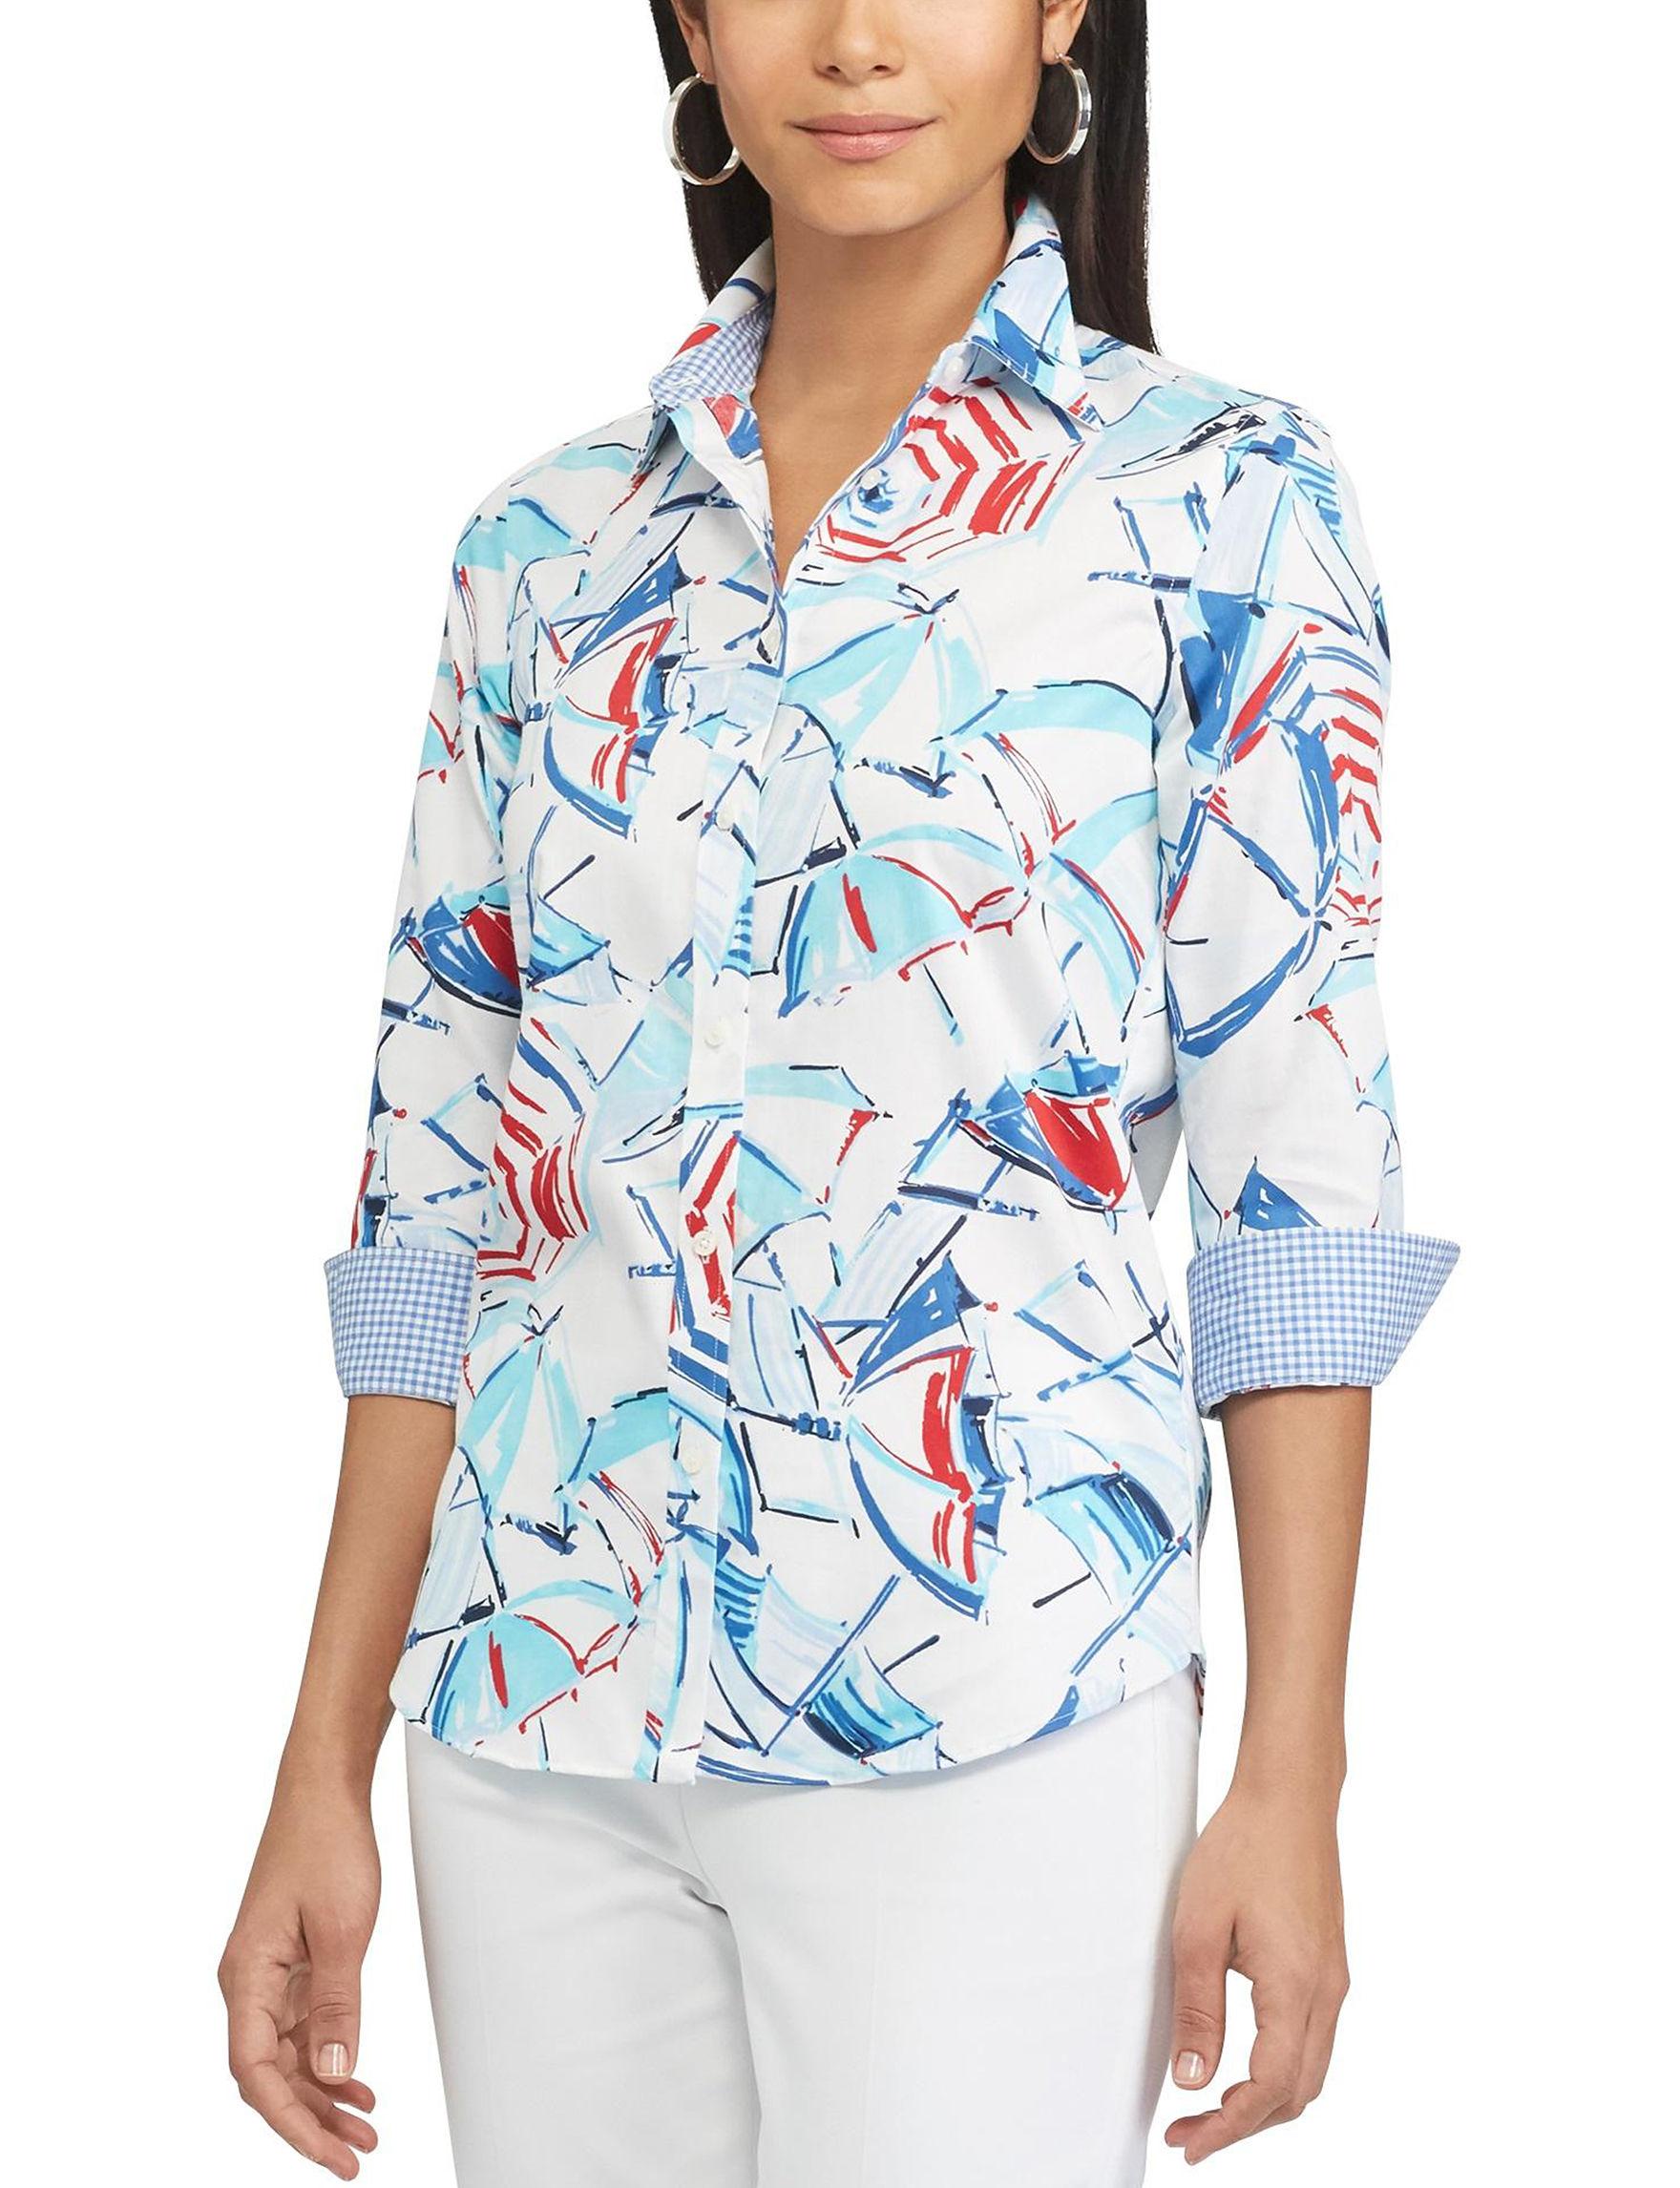 Chaps White Multi Shirts & Blouses